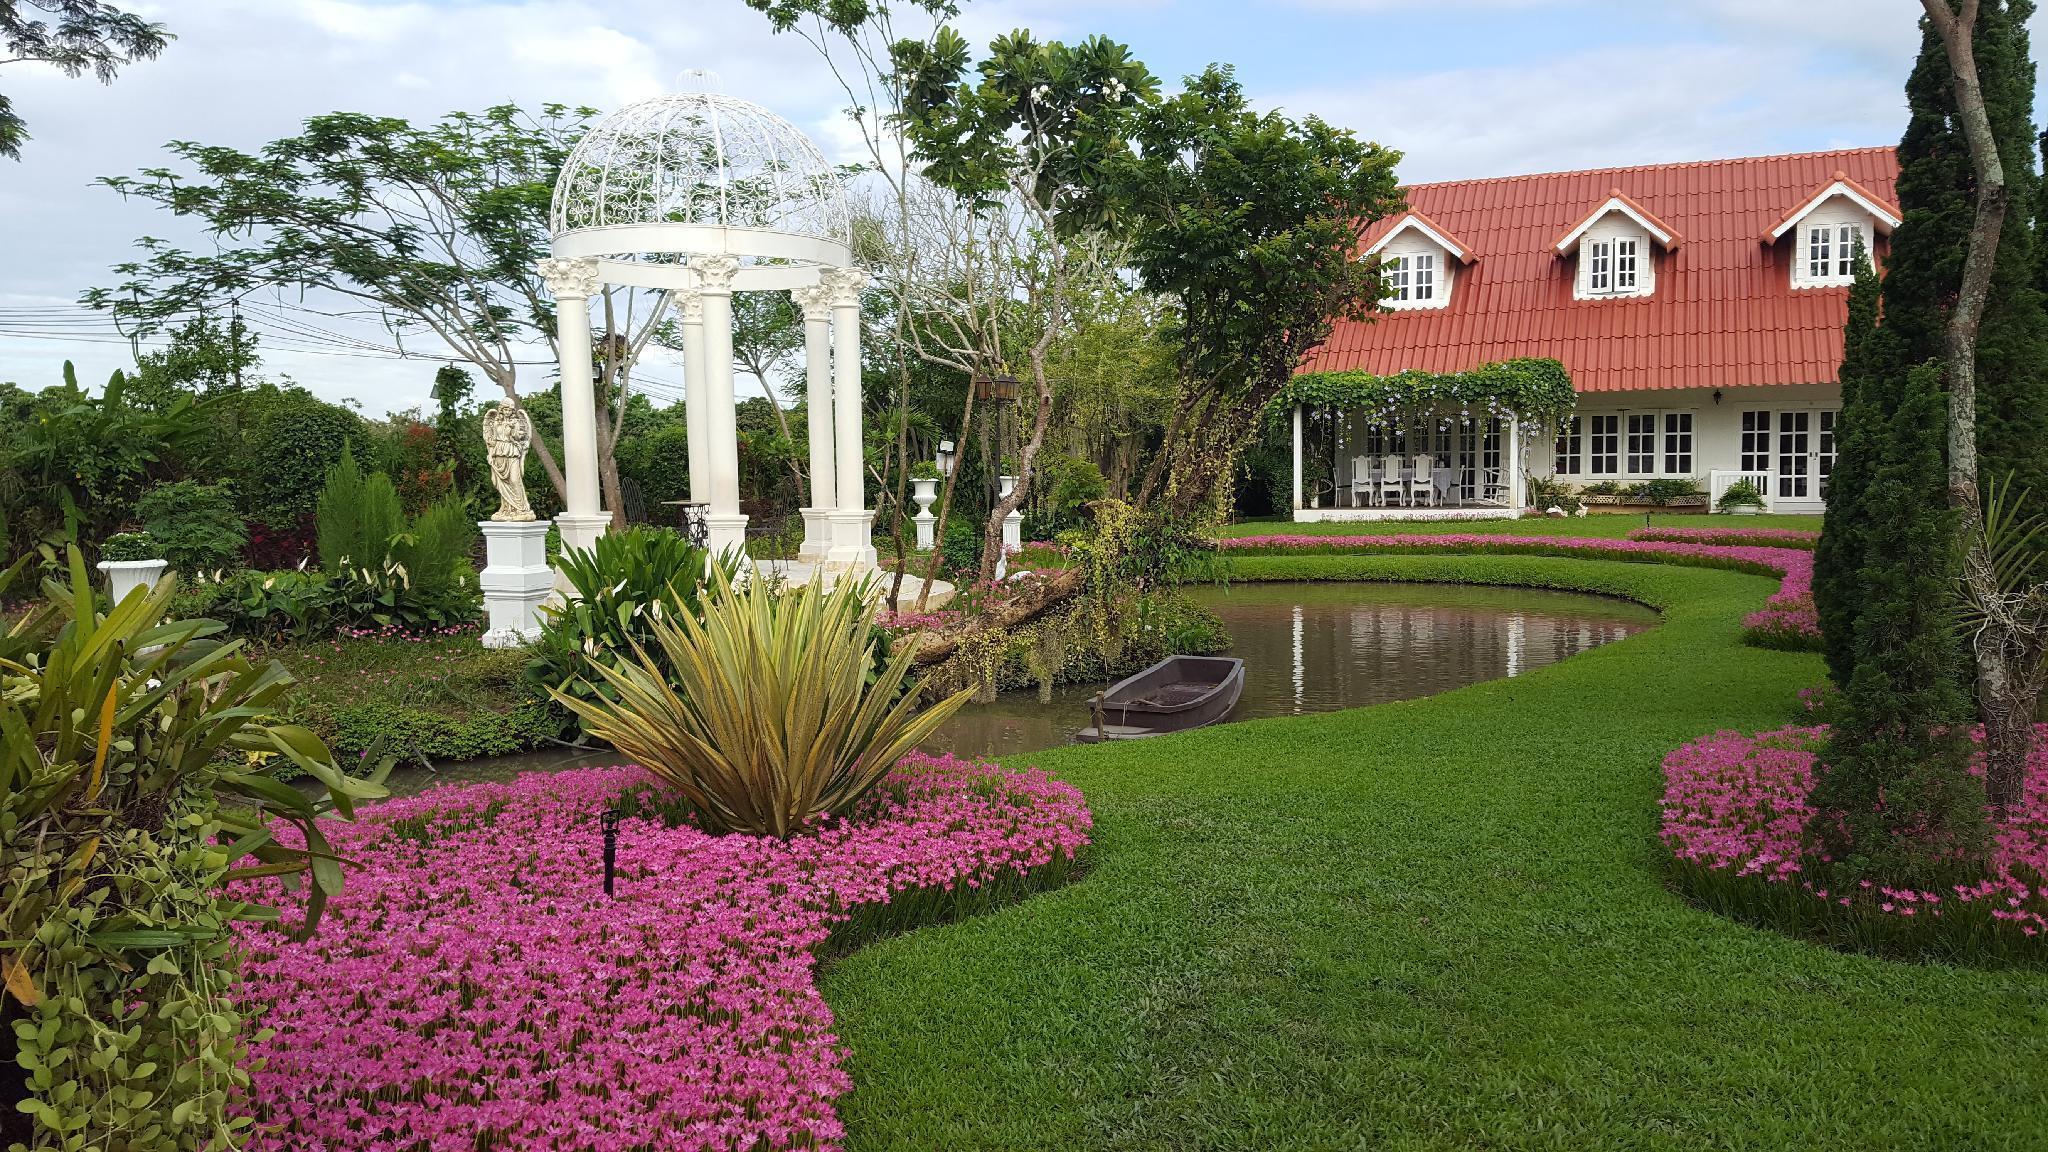 Beloved Cottage, located in the garden, peaceful. วิลลา 3 ห้องนอน 3 ห้องน้ำส่วนตัว ขนาด 170 ตร.ม. – สารภี